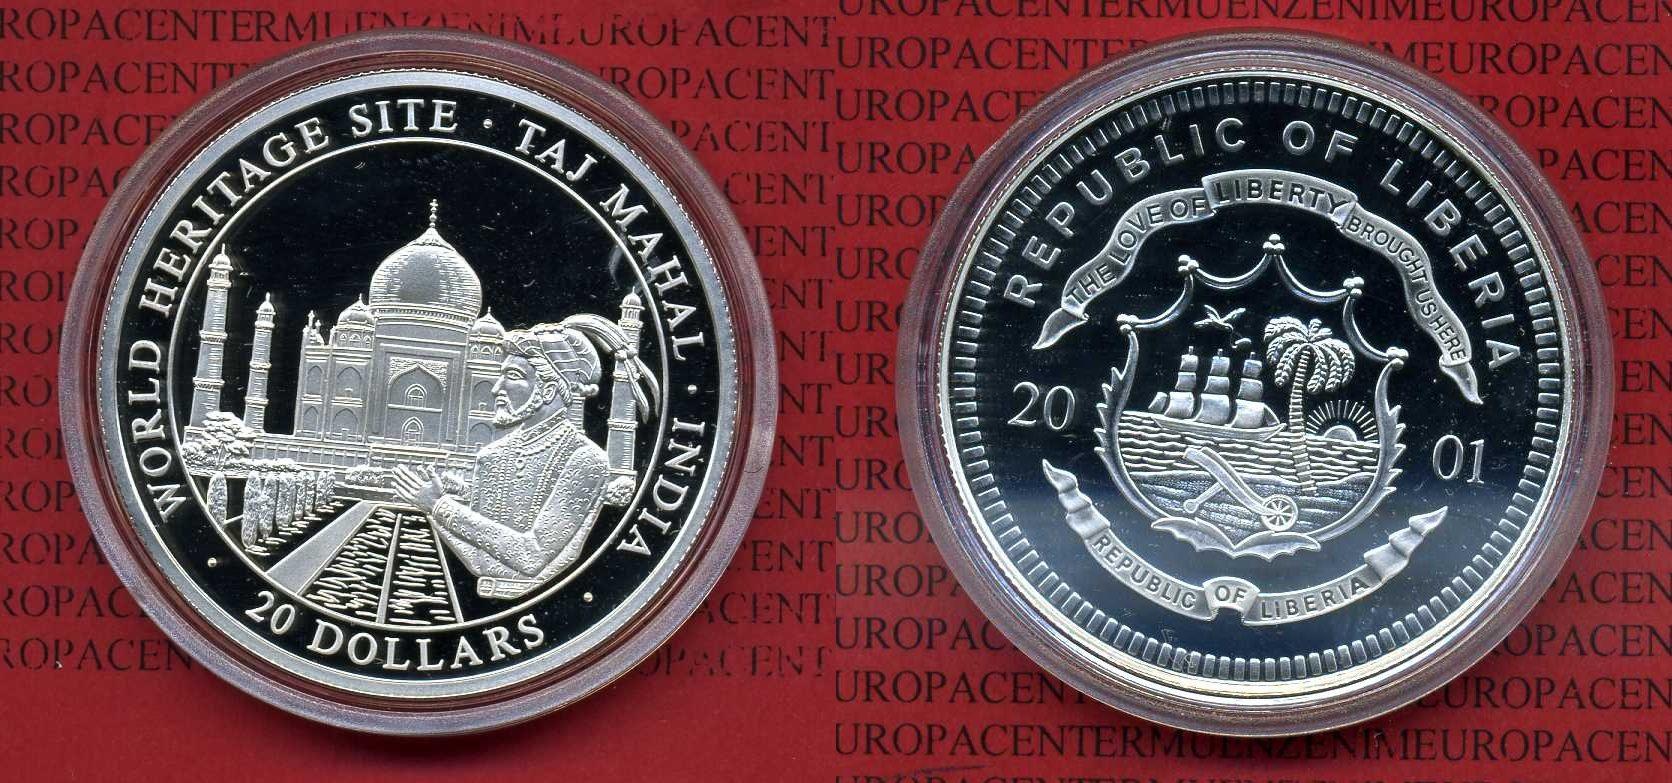 20 Dollars Silber Münze 2001 Liberia Liberia Silber 20 Dollars 2001